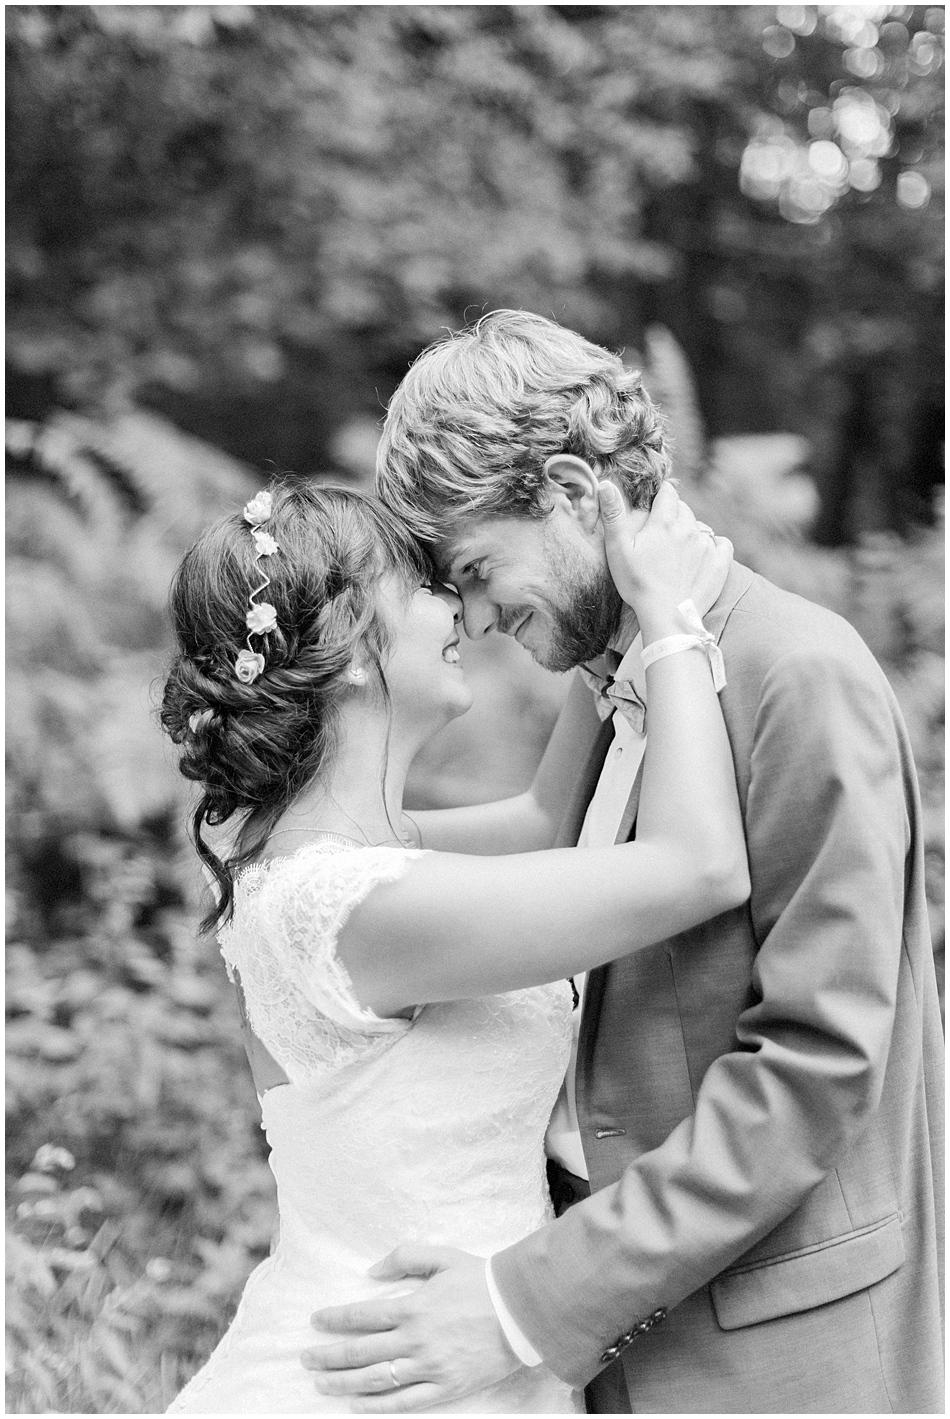 Marie-Alice G-Photographe Mariage France Normandie - Photographe Mariage Manche valognes cherbourg - Wedding Photographer France_0164